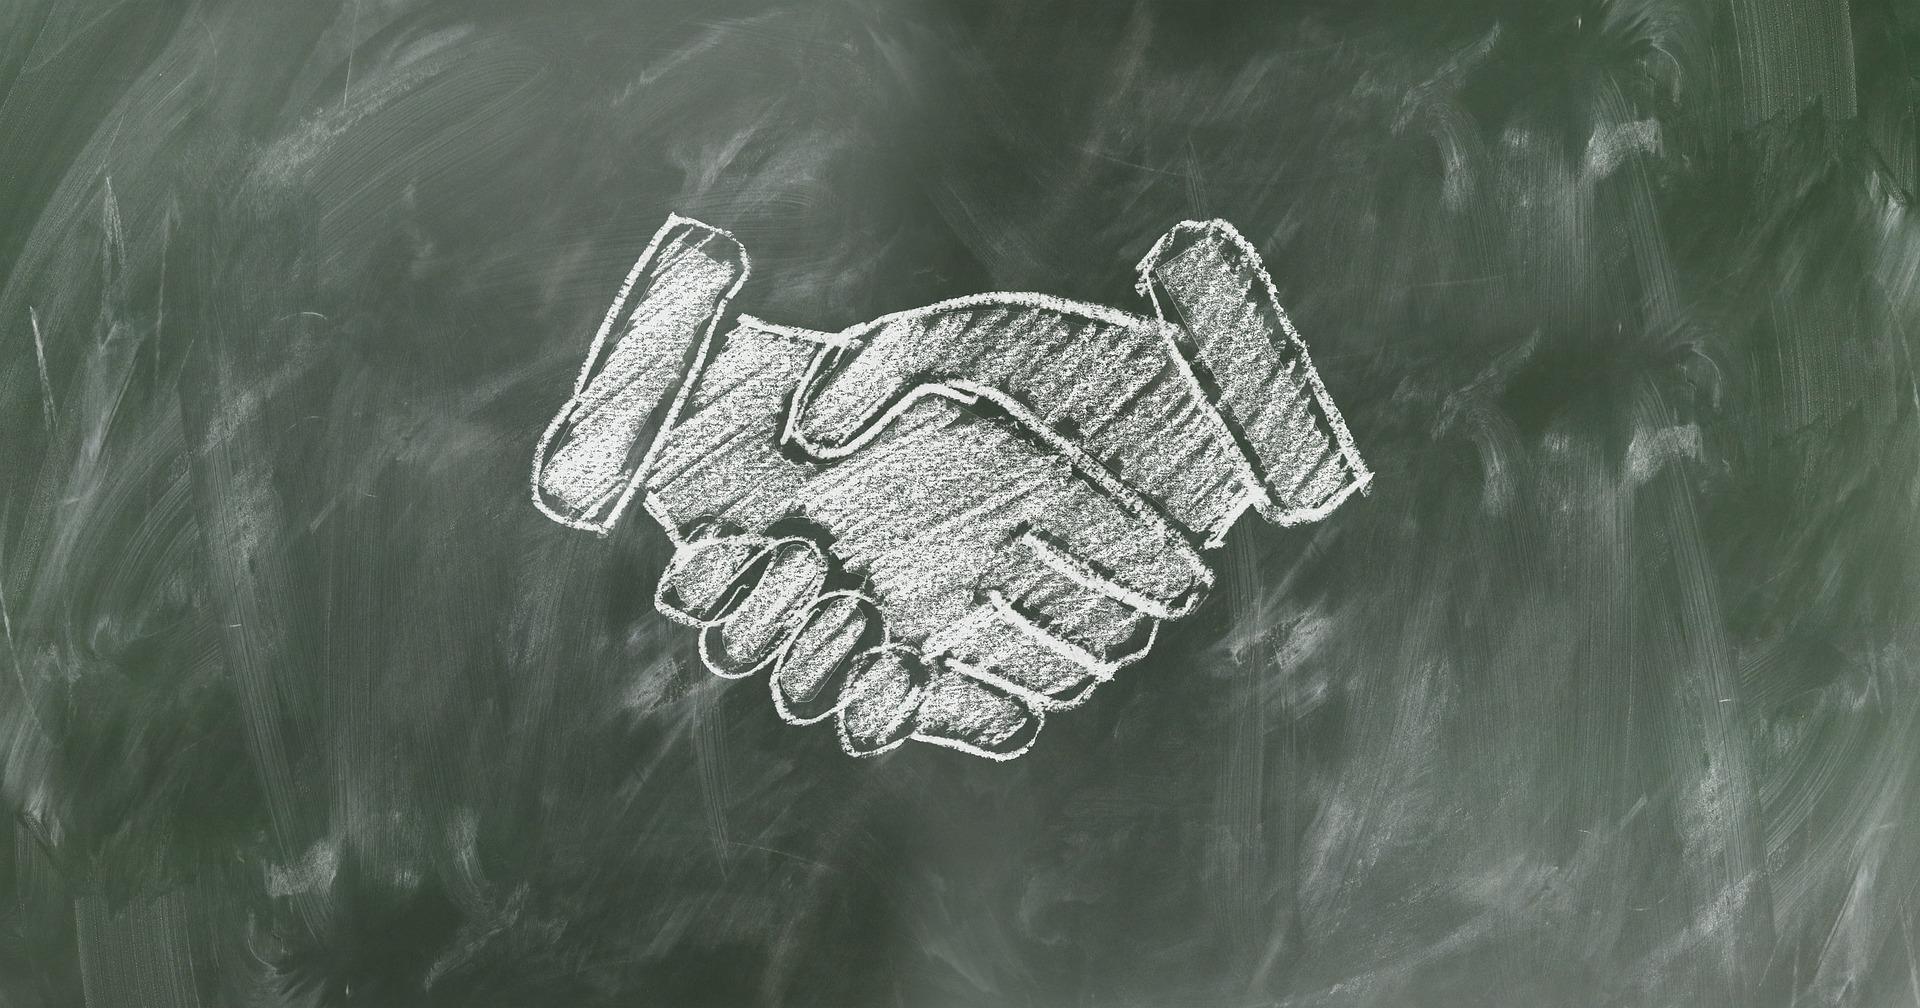 shaking-hands-2499612_1920